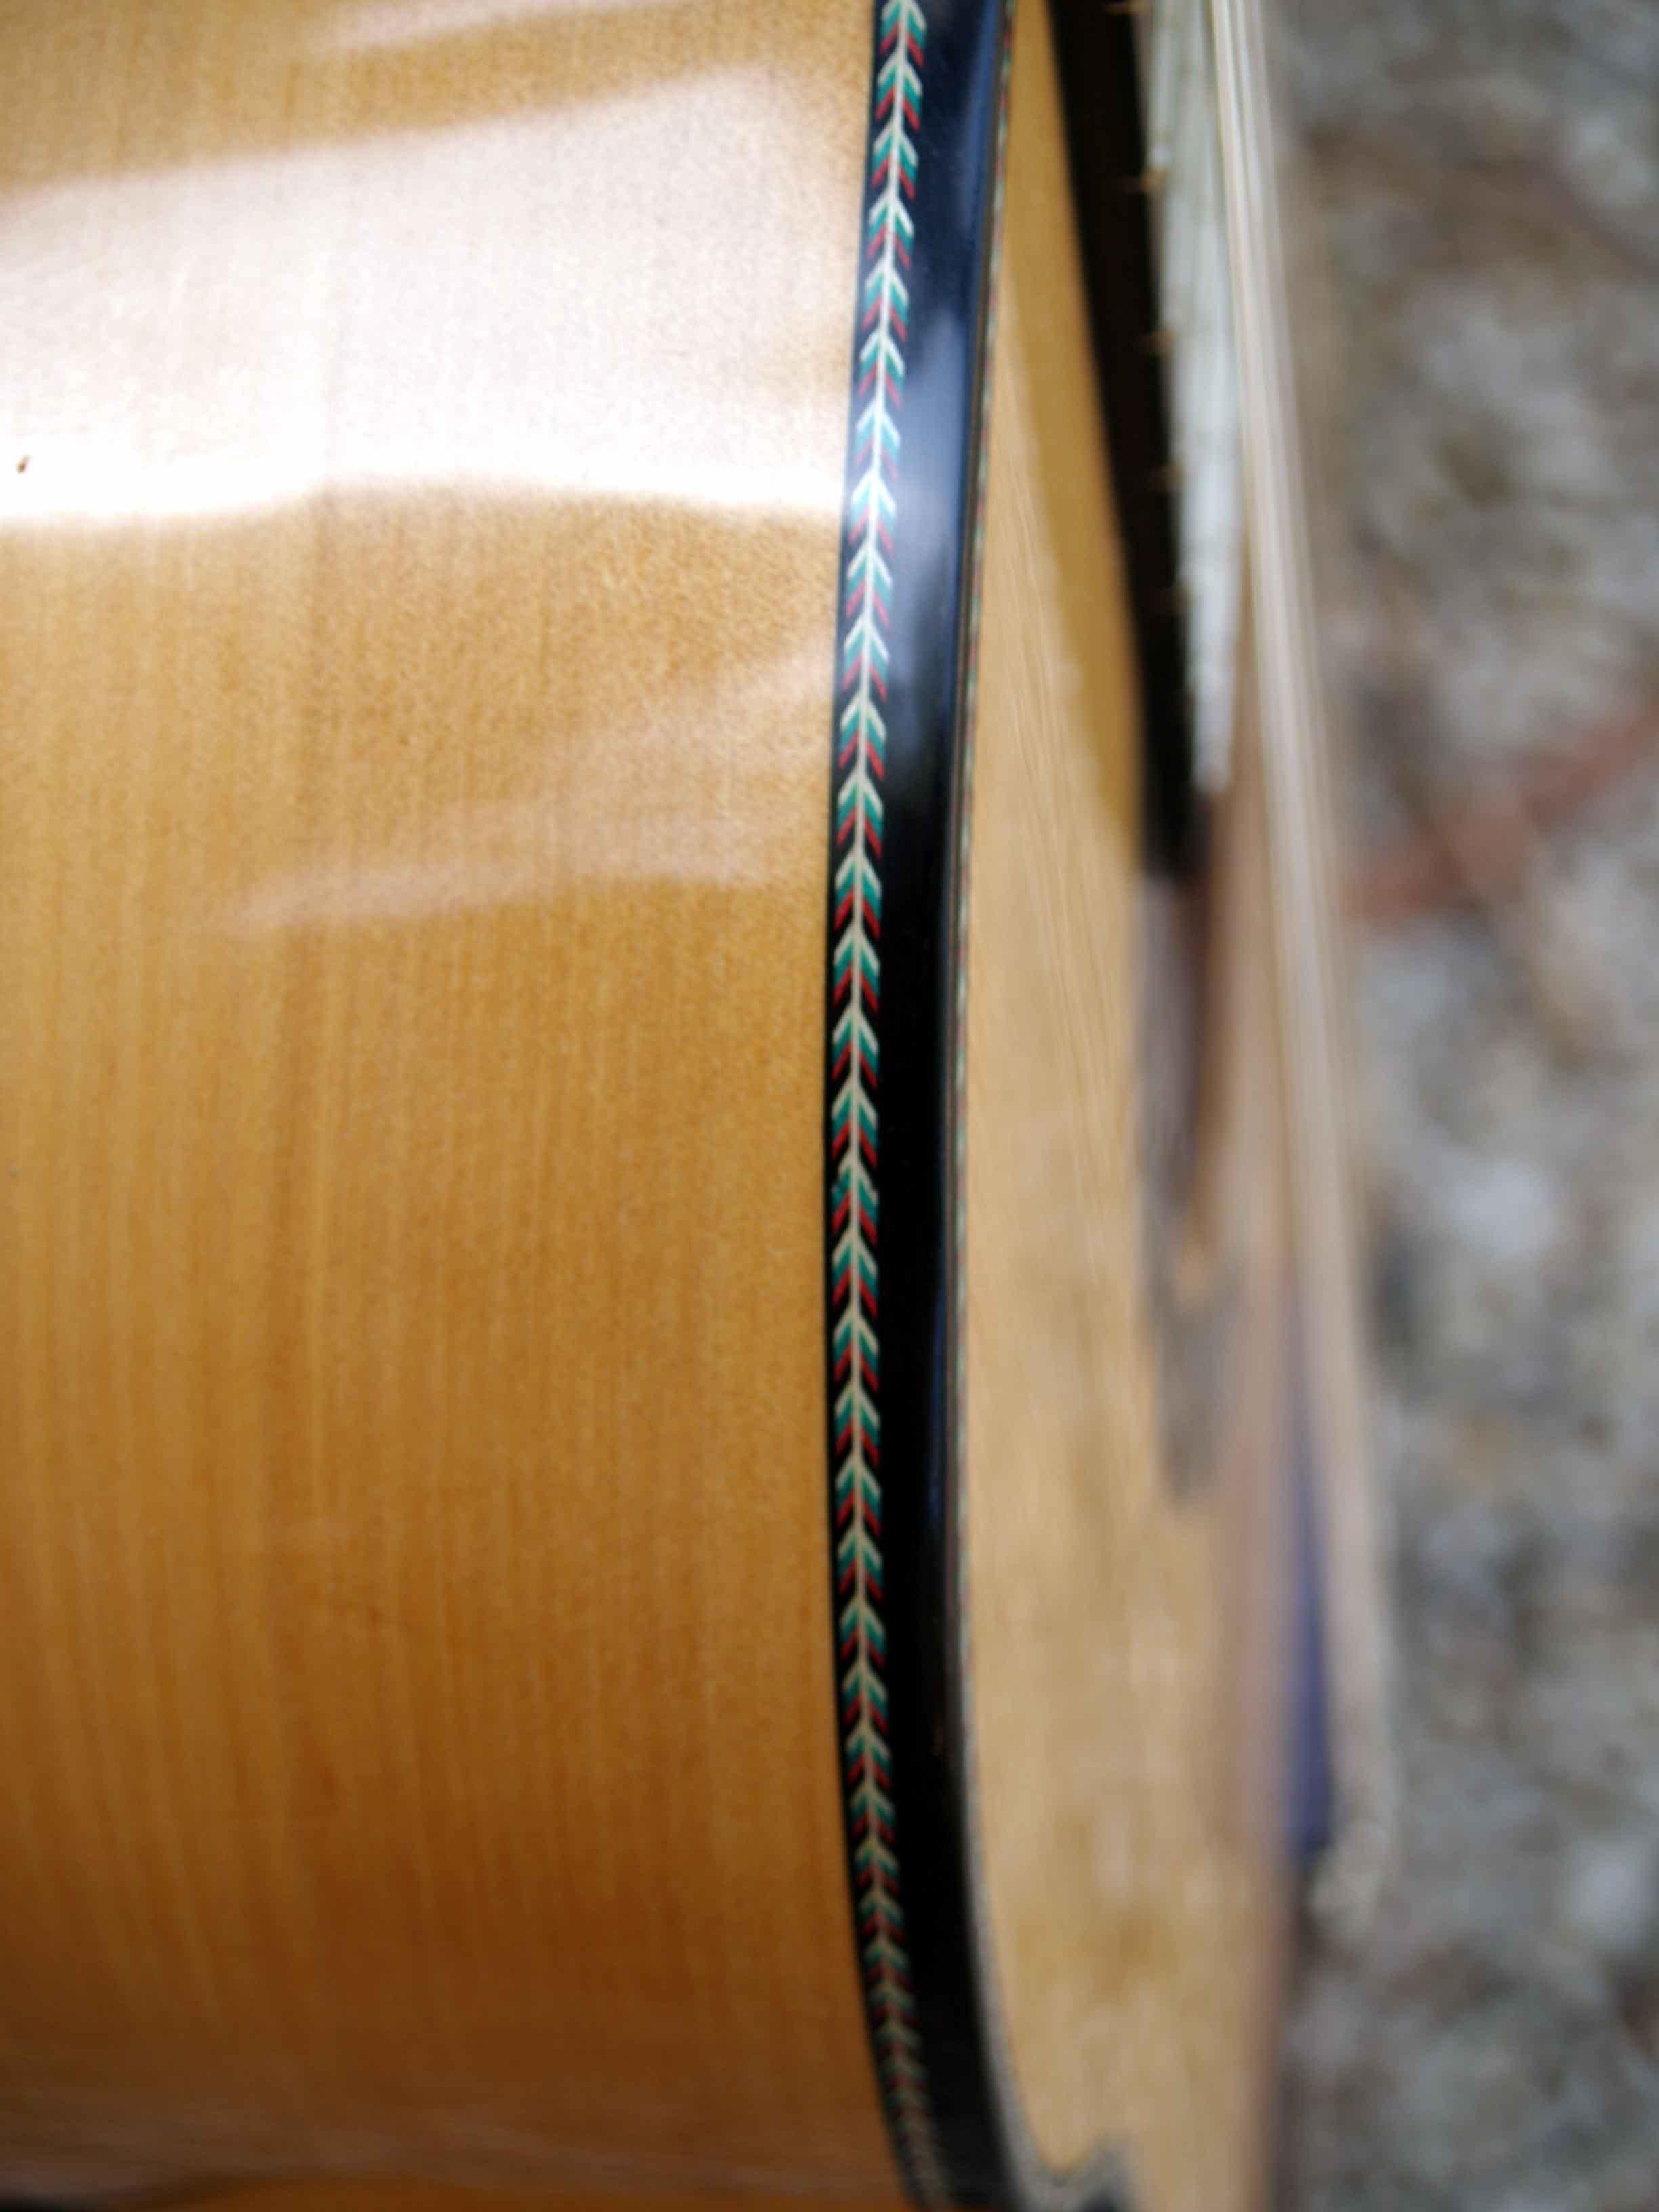 Flamenco guitar spikes binding